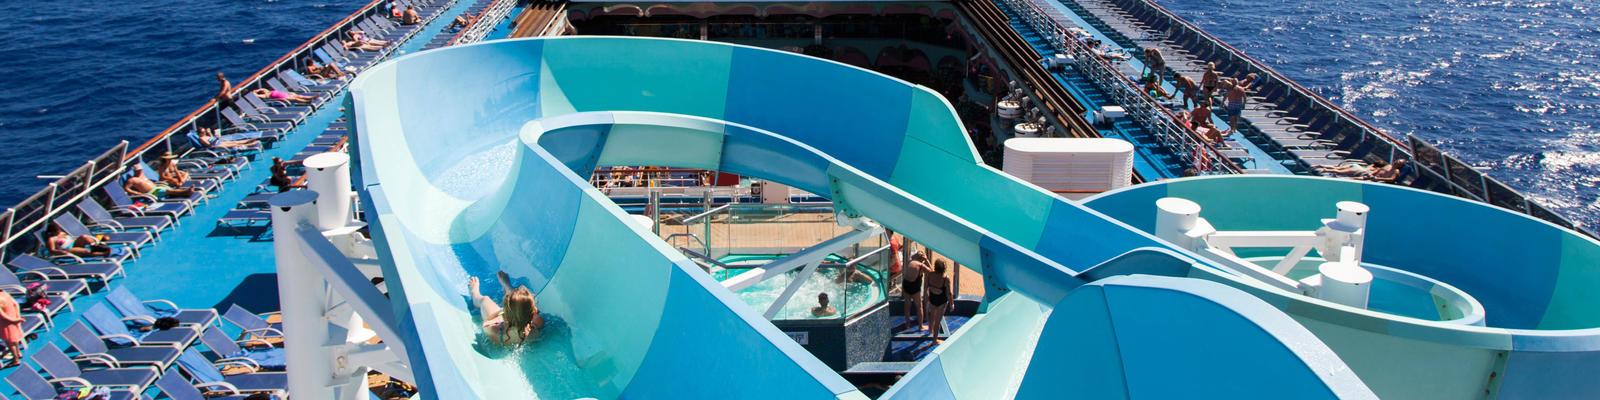 f176bdf72b6d 5 Best Cruise Ship Water Parks (Photo  Cruise Critic)